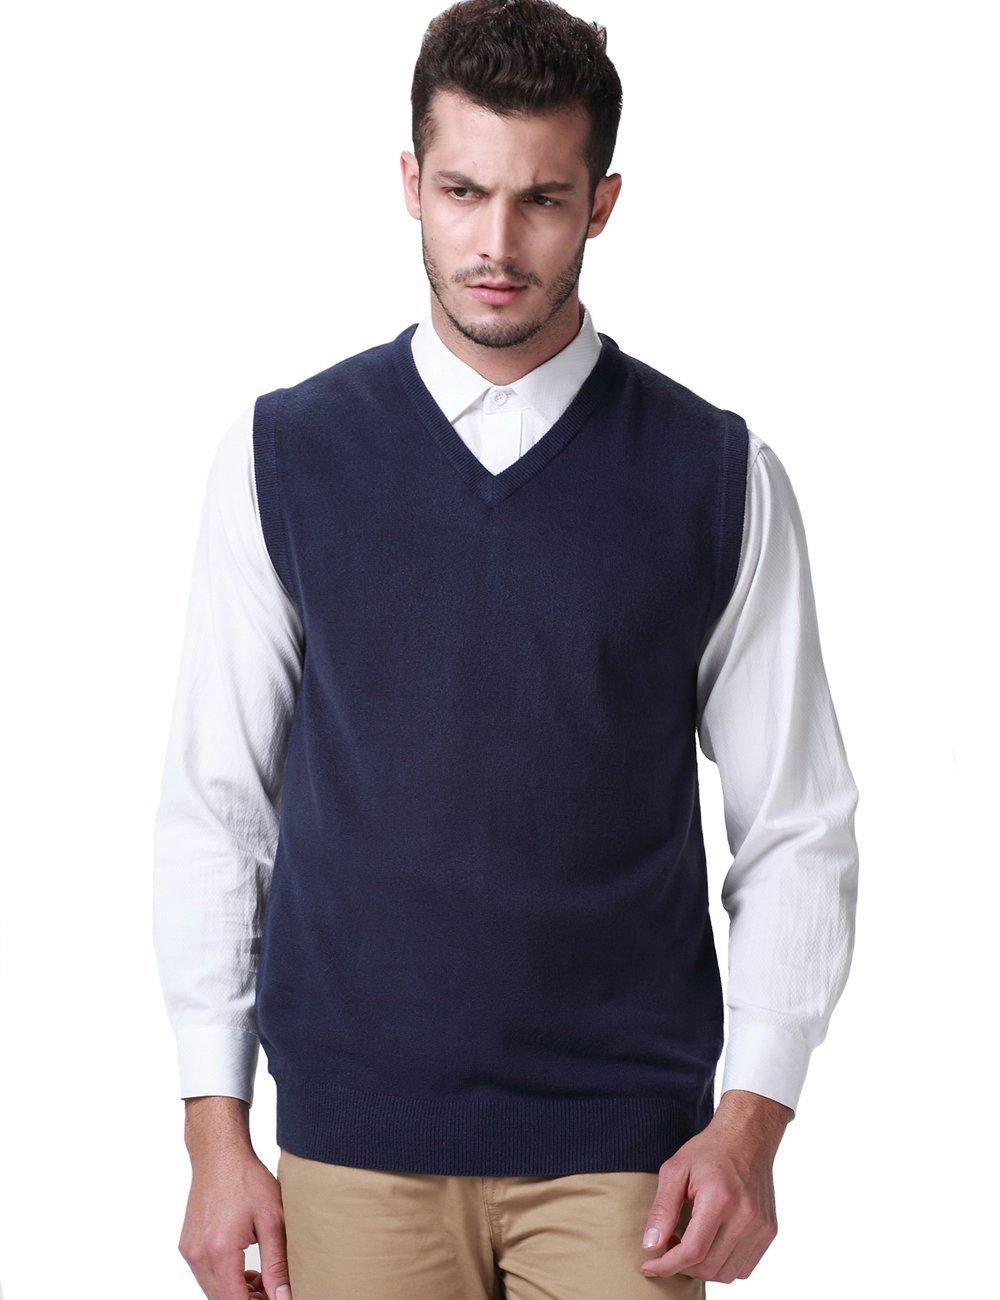 SSLR Men's Candy Color Sweater Vest Pullover